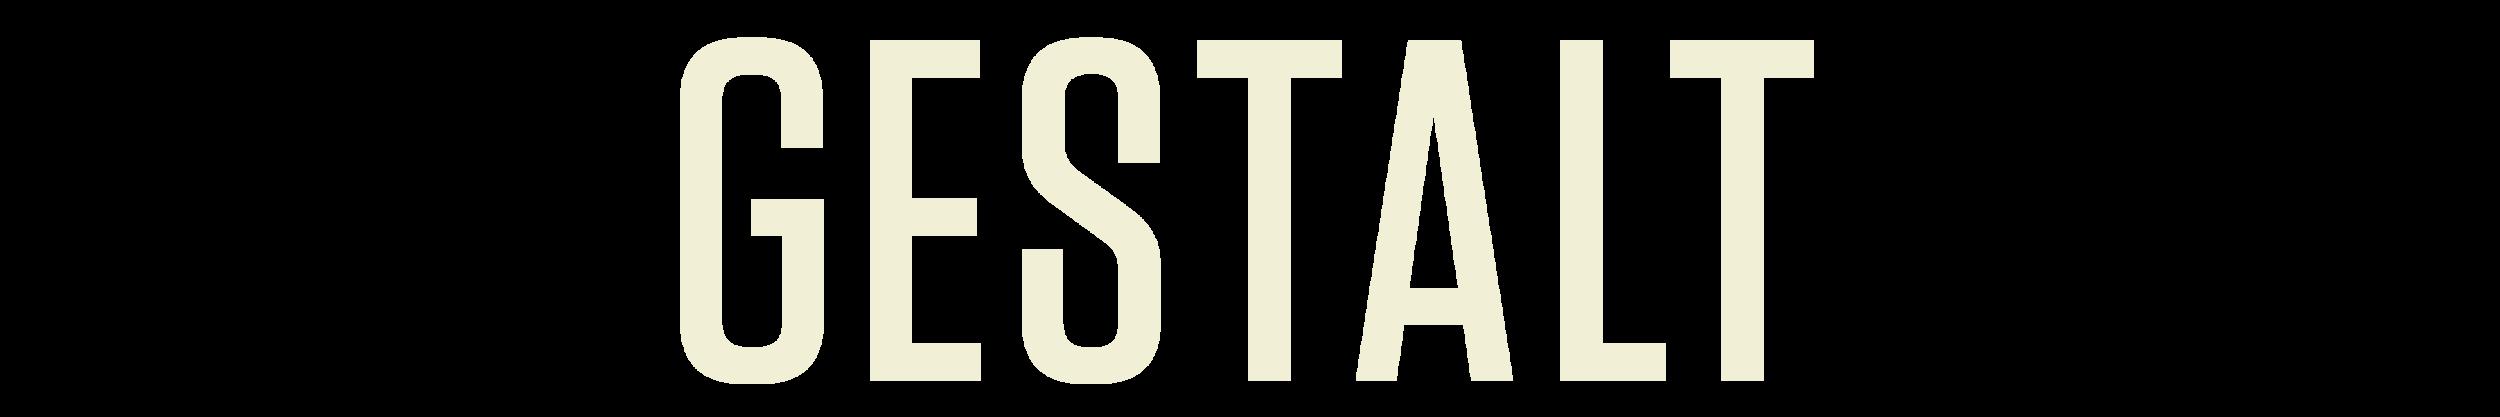 Gestalt logo cream-01.png